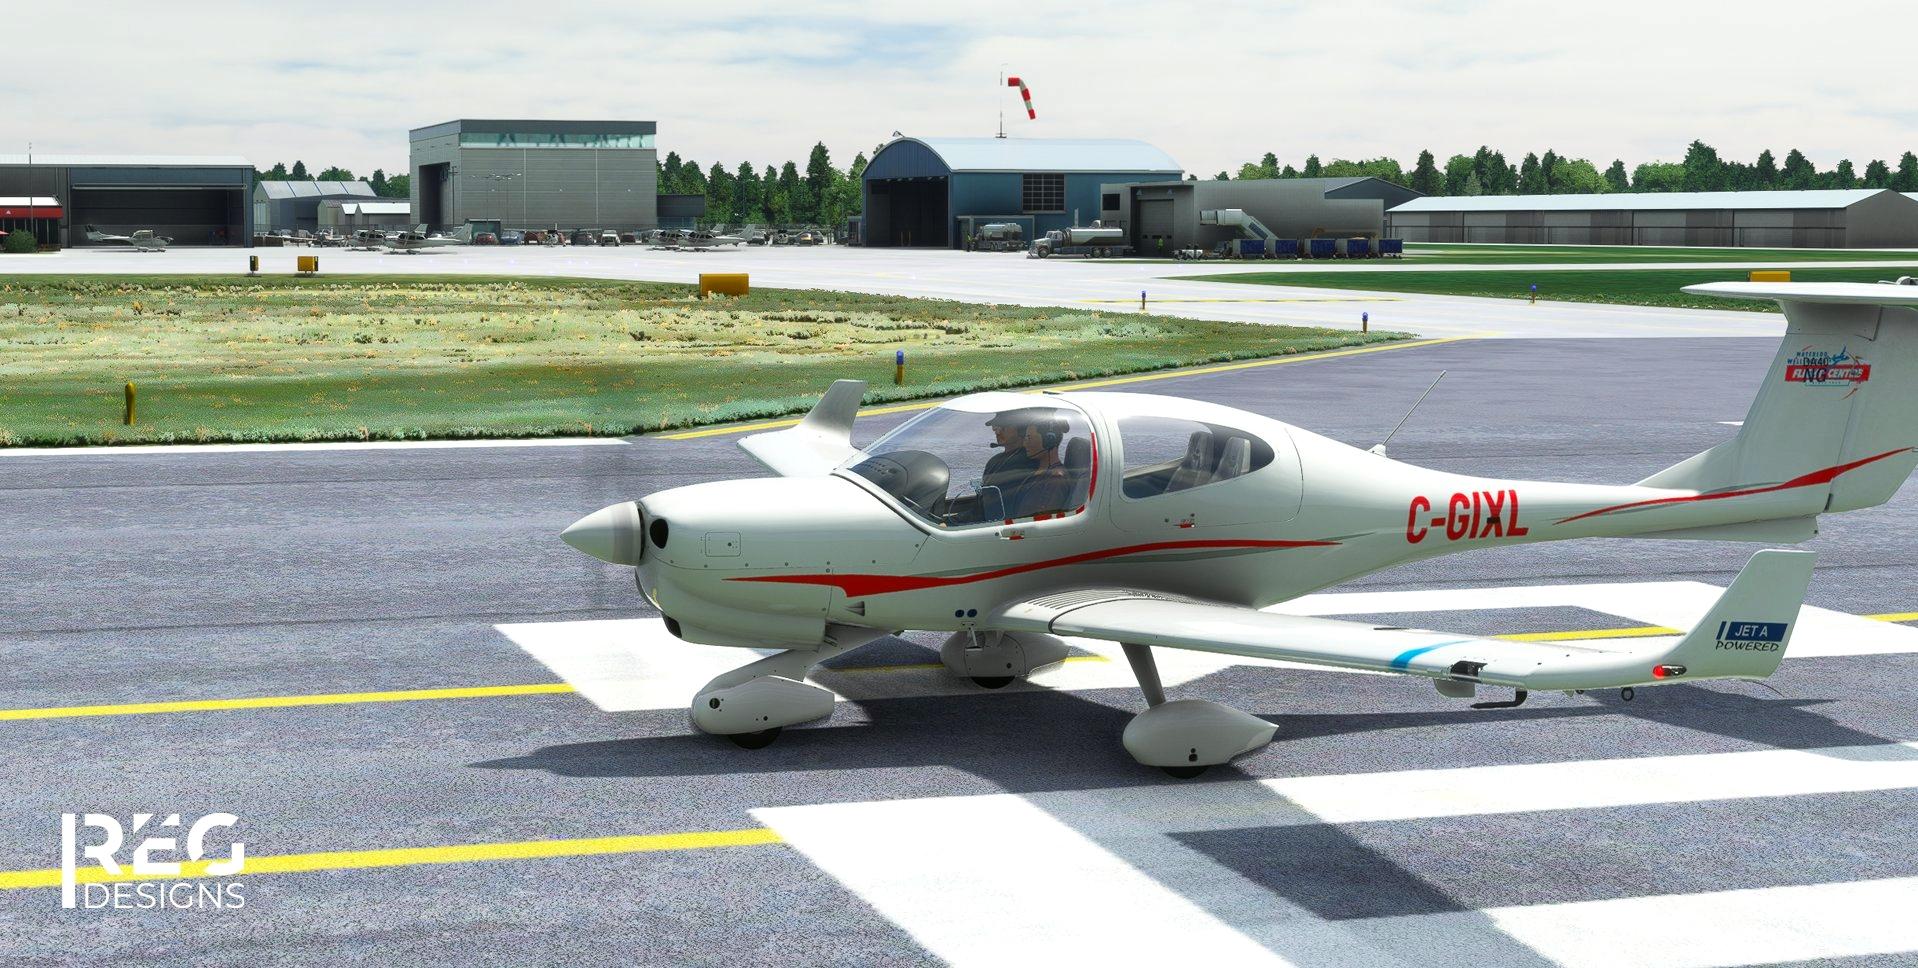 [CYKF] Region of Waterloo International Airport